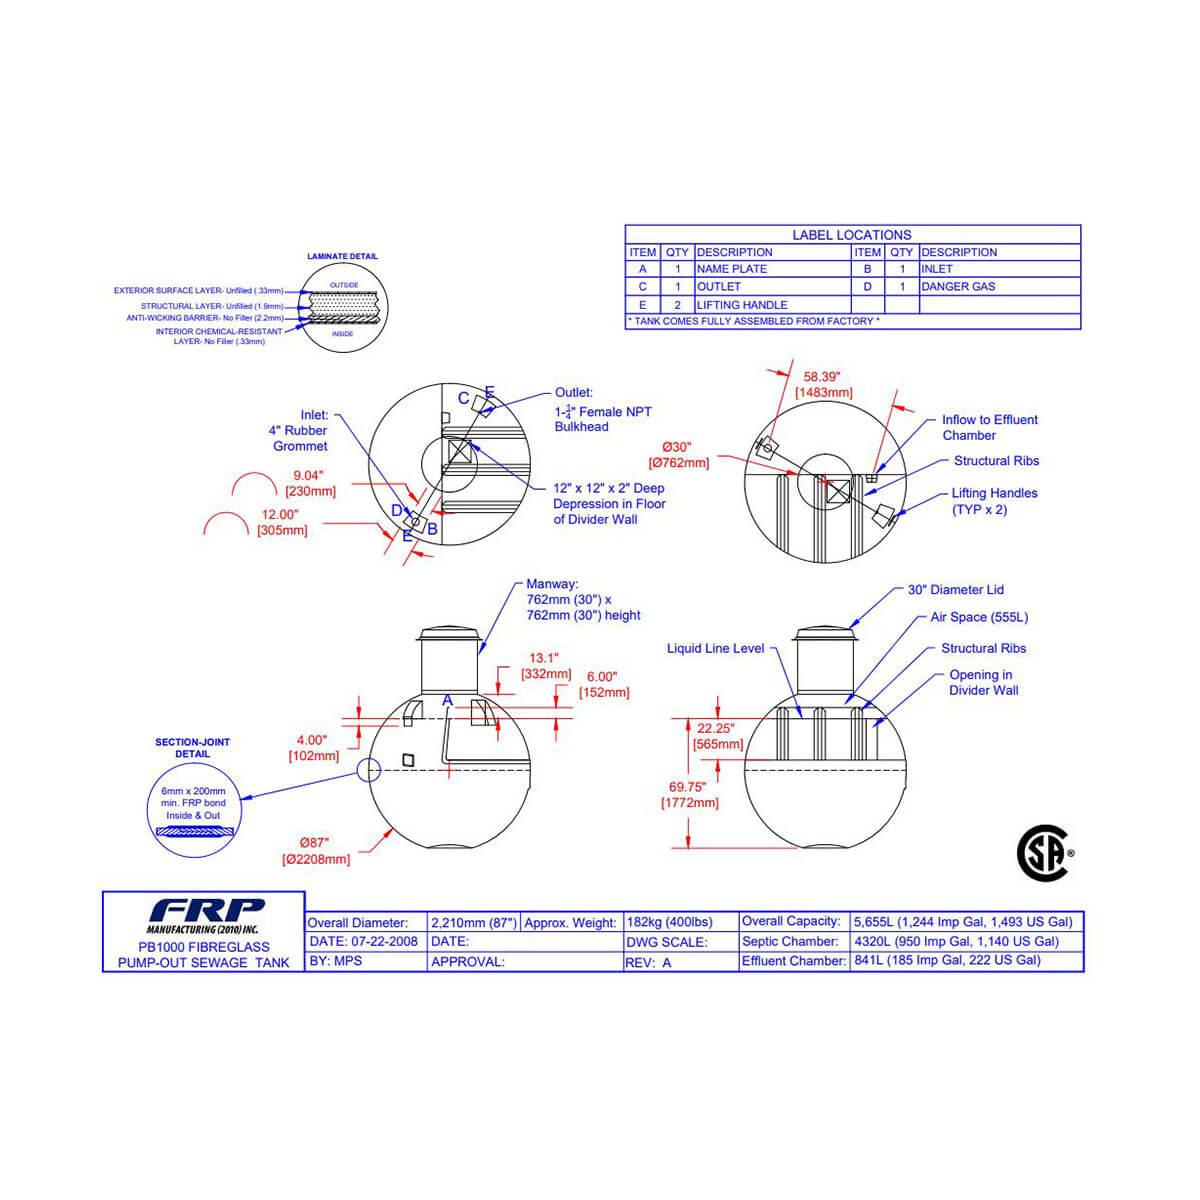 Fibreglass Pump Out Sewage Tank - PB1000